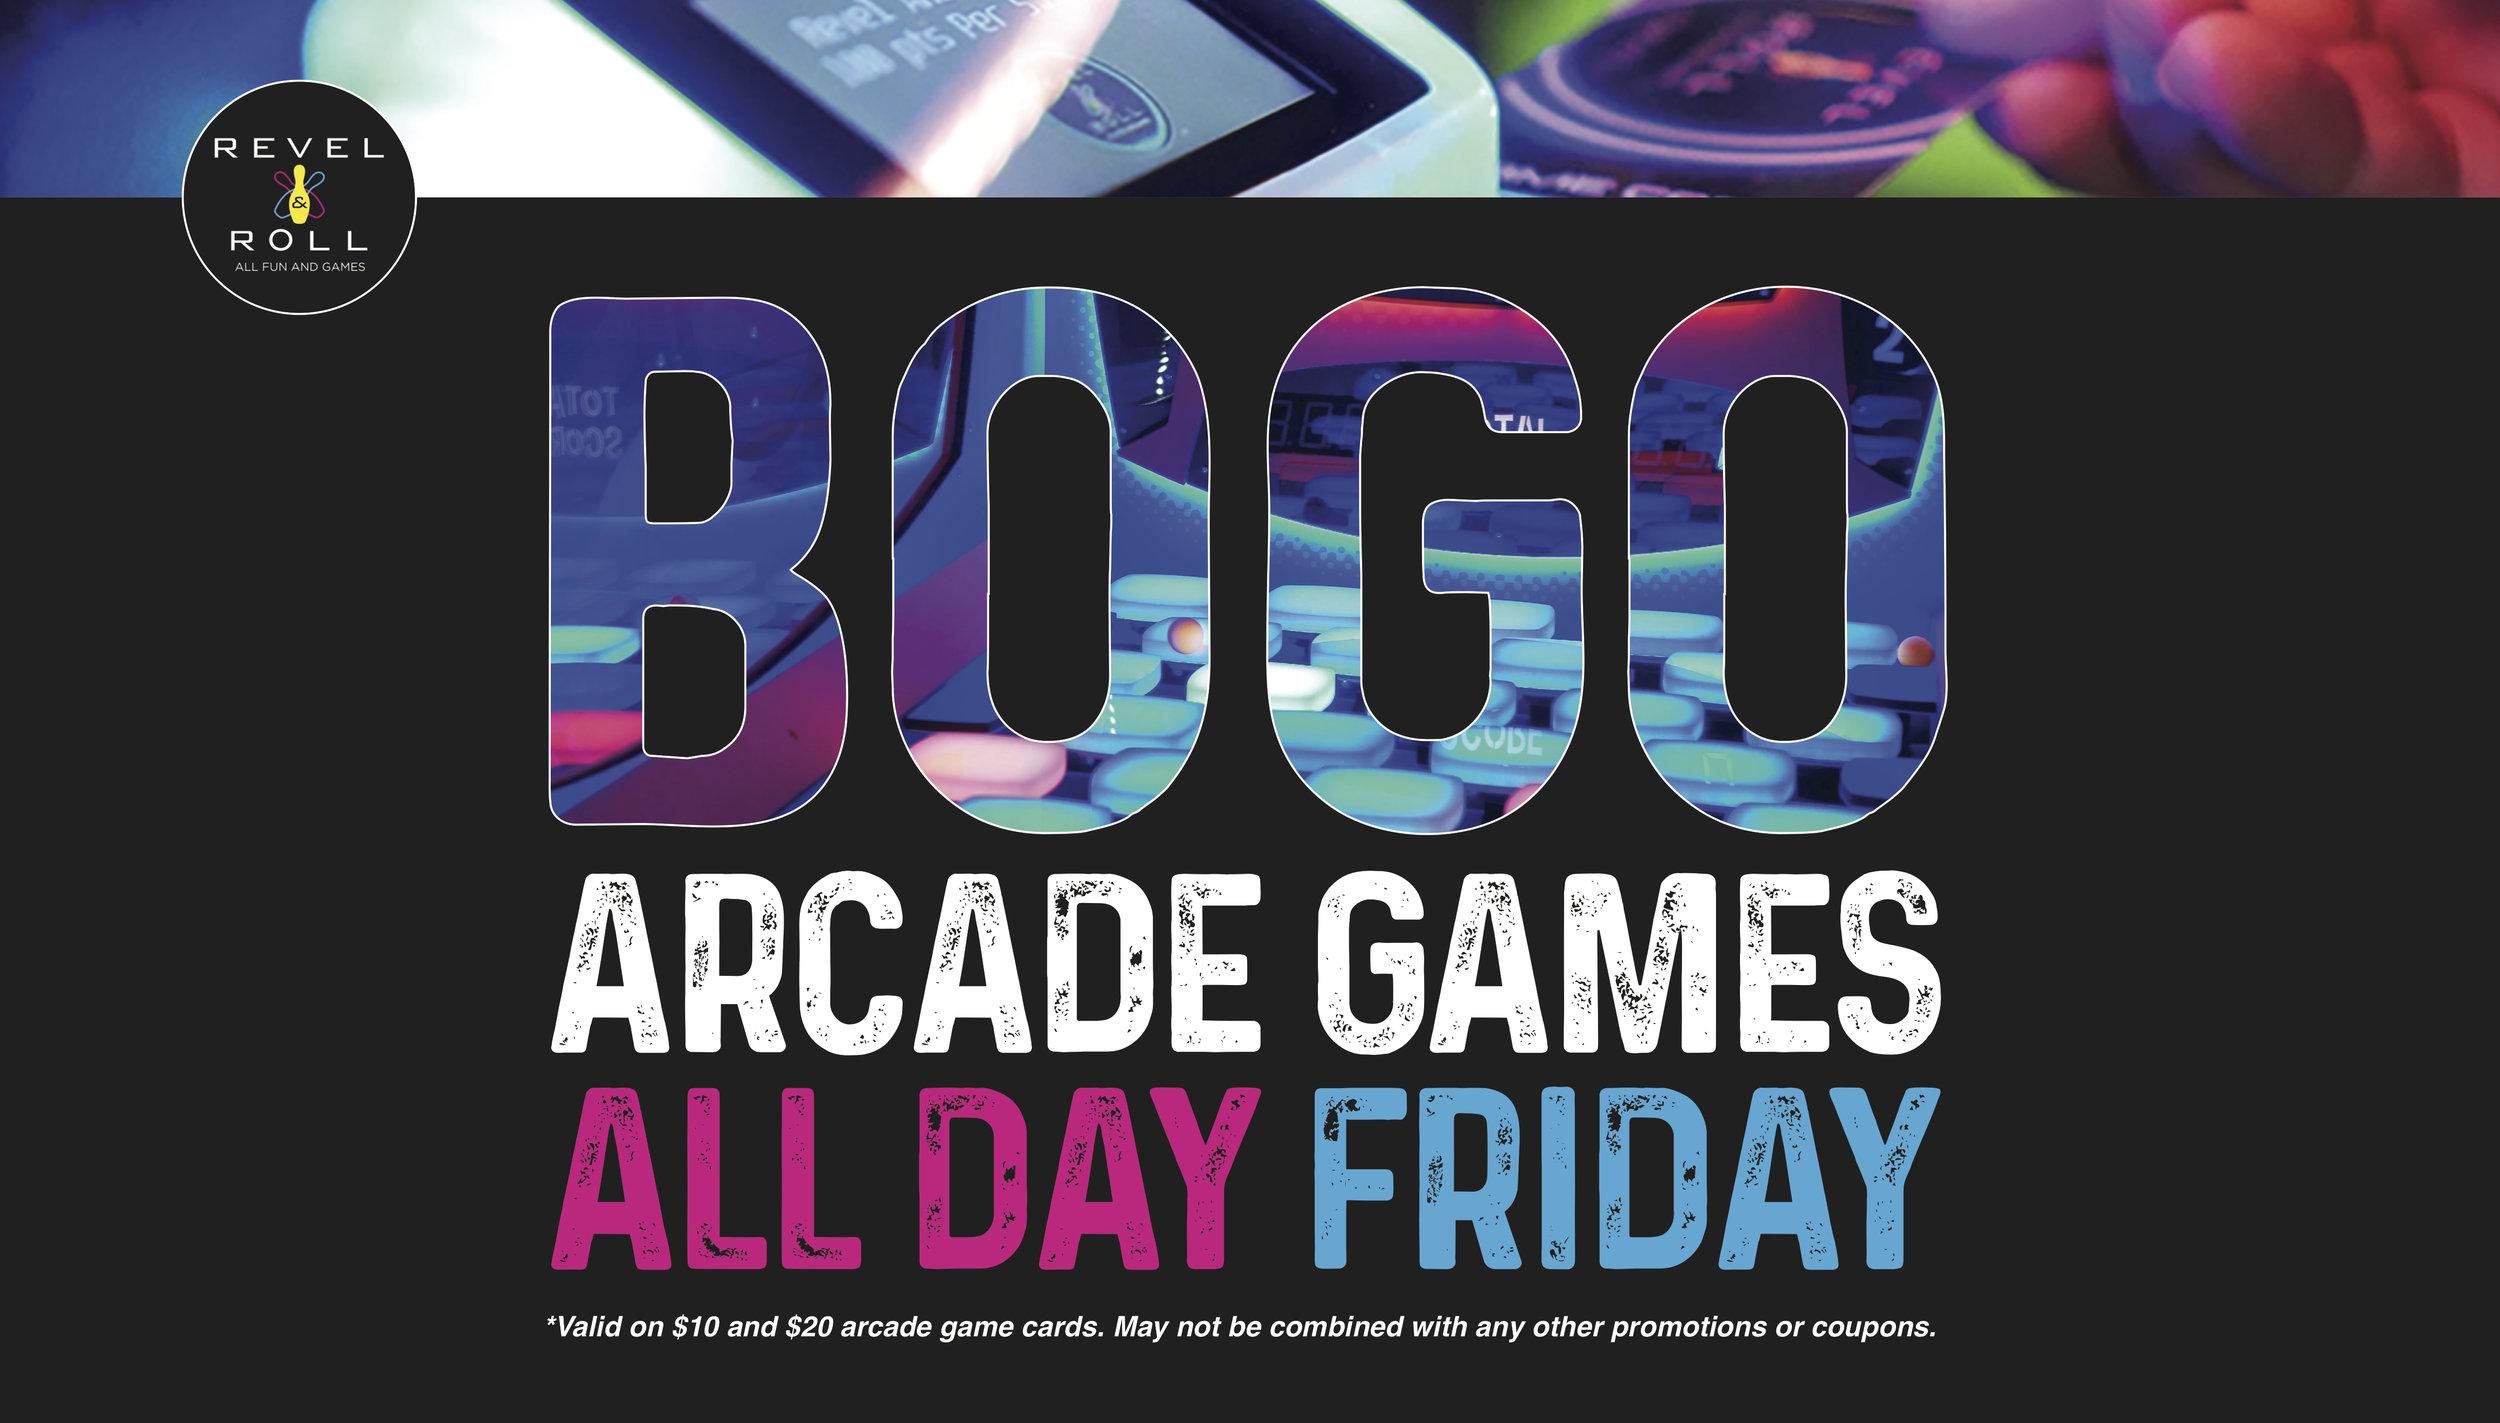 bogo_arcade_16x9.jpg